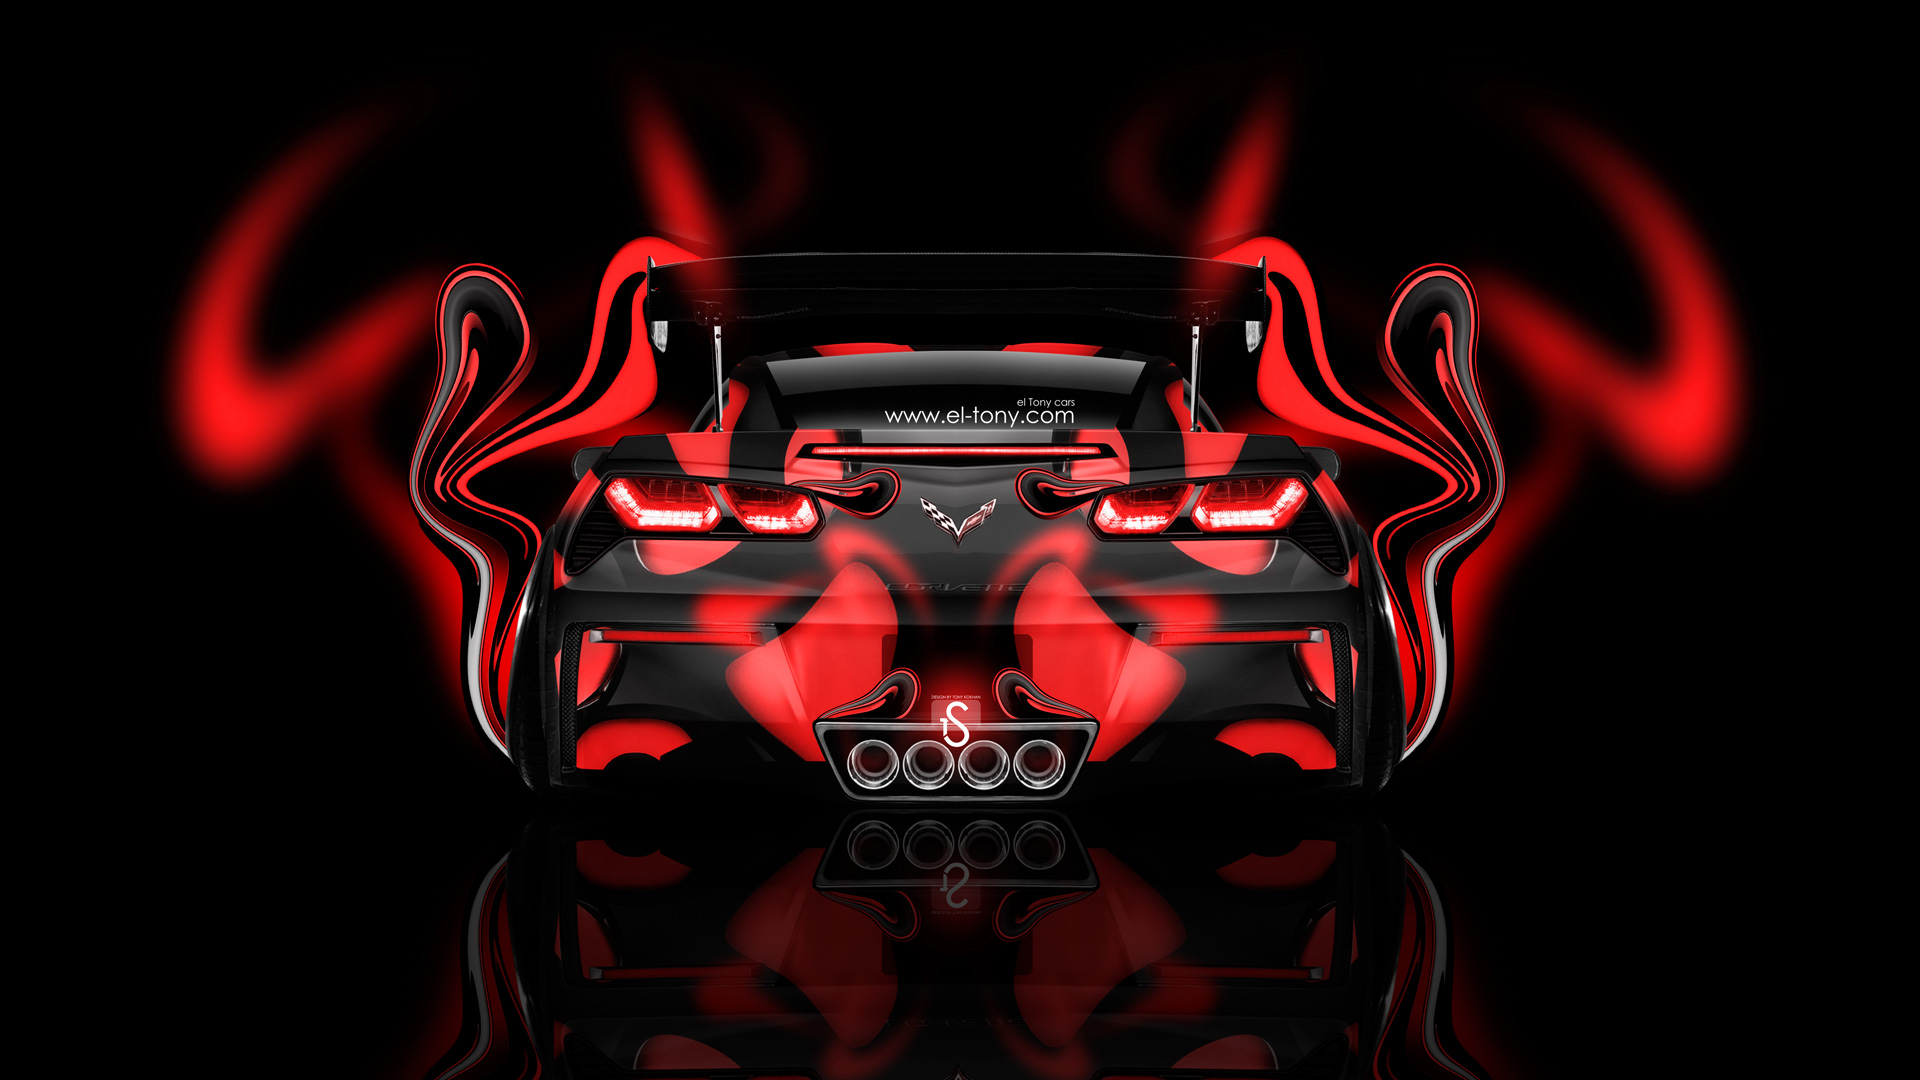 c7 corvette desktop backgrounds